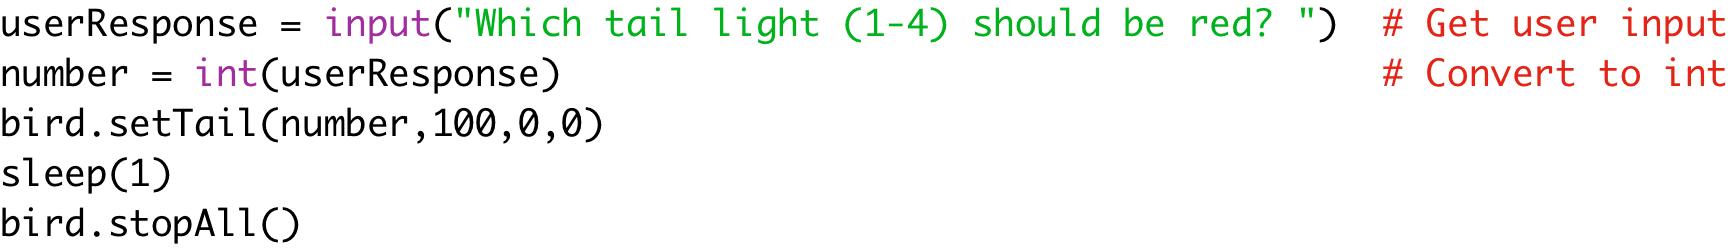 "userResponse = input(""Which tail light (1-4) should be red? "") # Get user input  number = int(userResponse) # Convert to int  bird.setTail(number,100,0,0)  sleep(1)  bird.stopAll()"